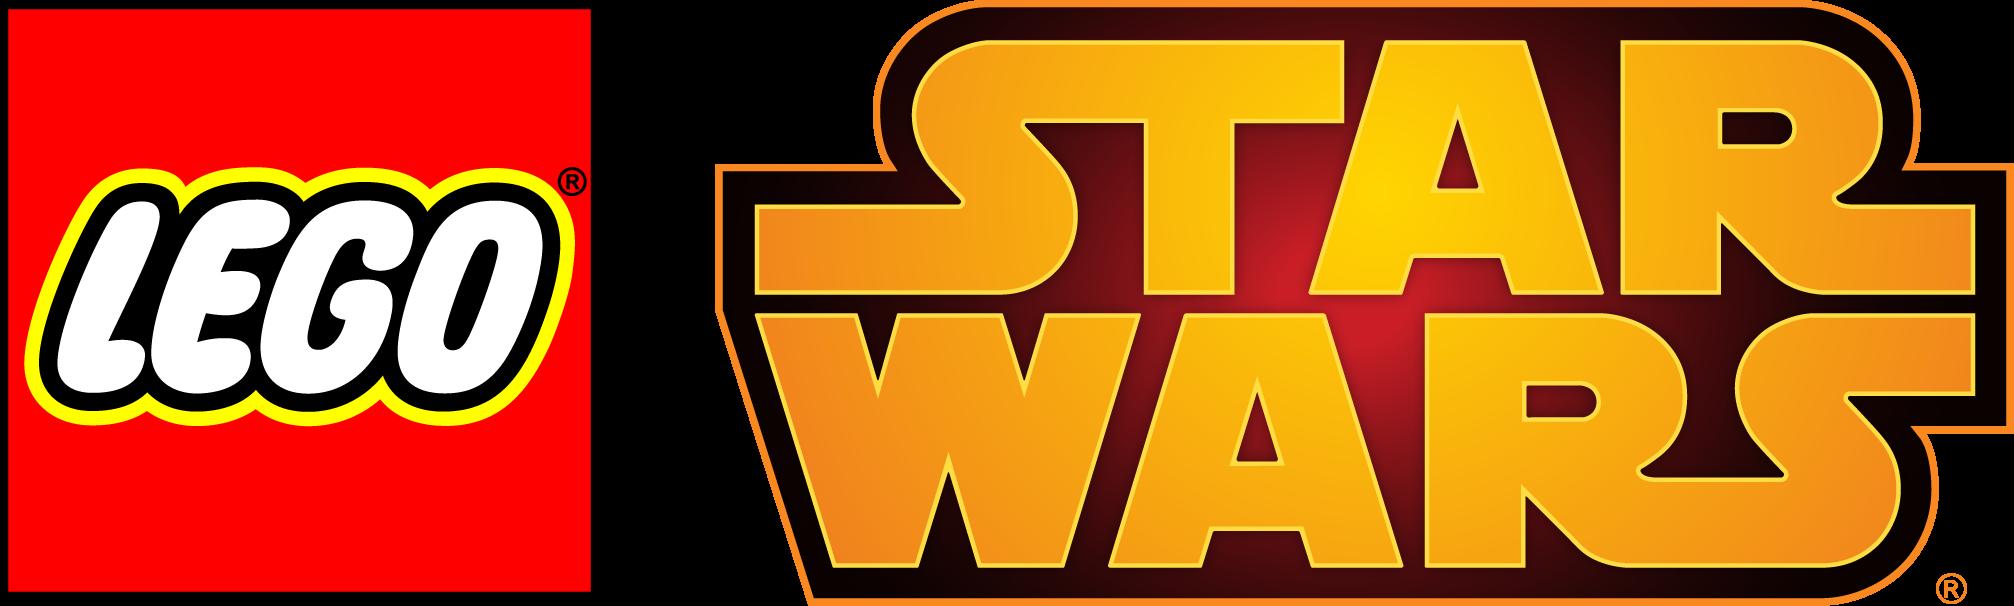 Lego Star Wars Logo Transparent & PNG Clipart Free Download.